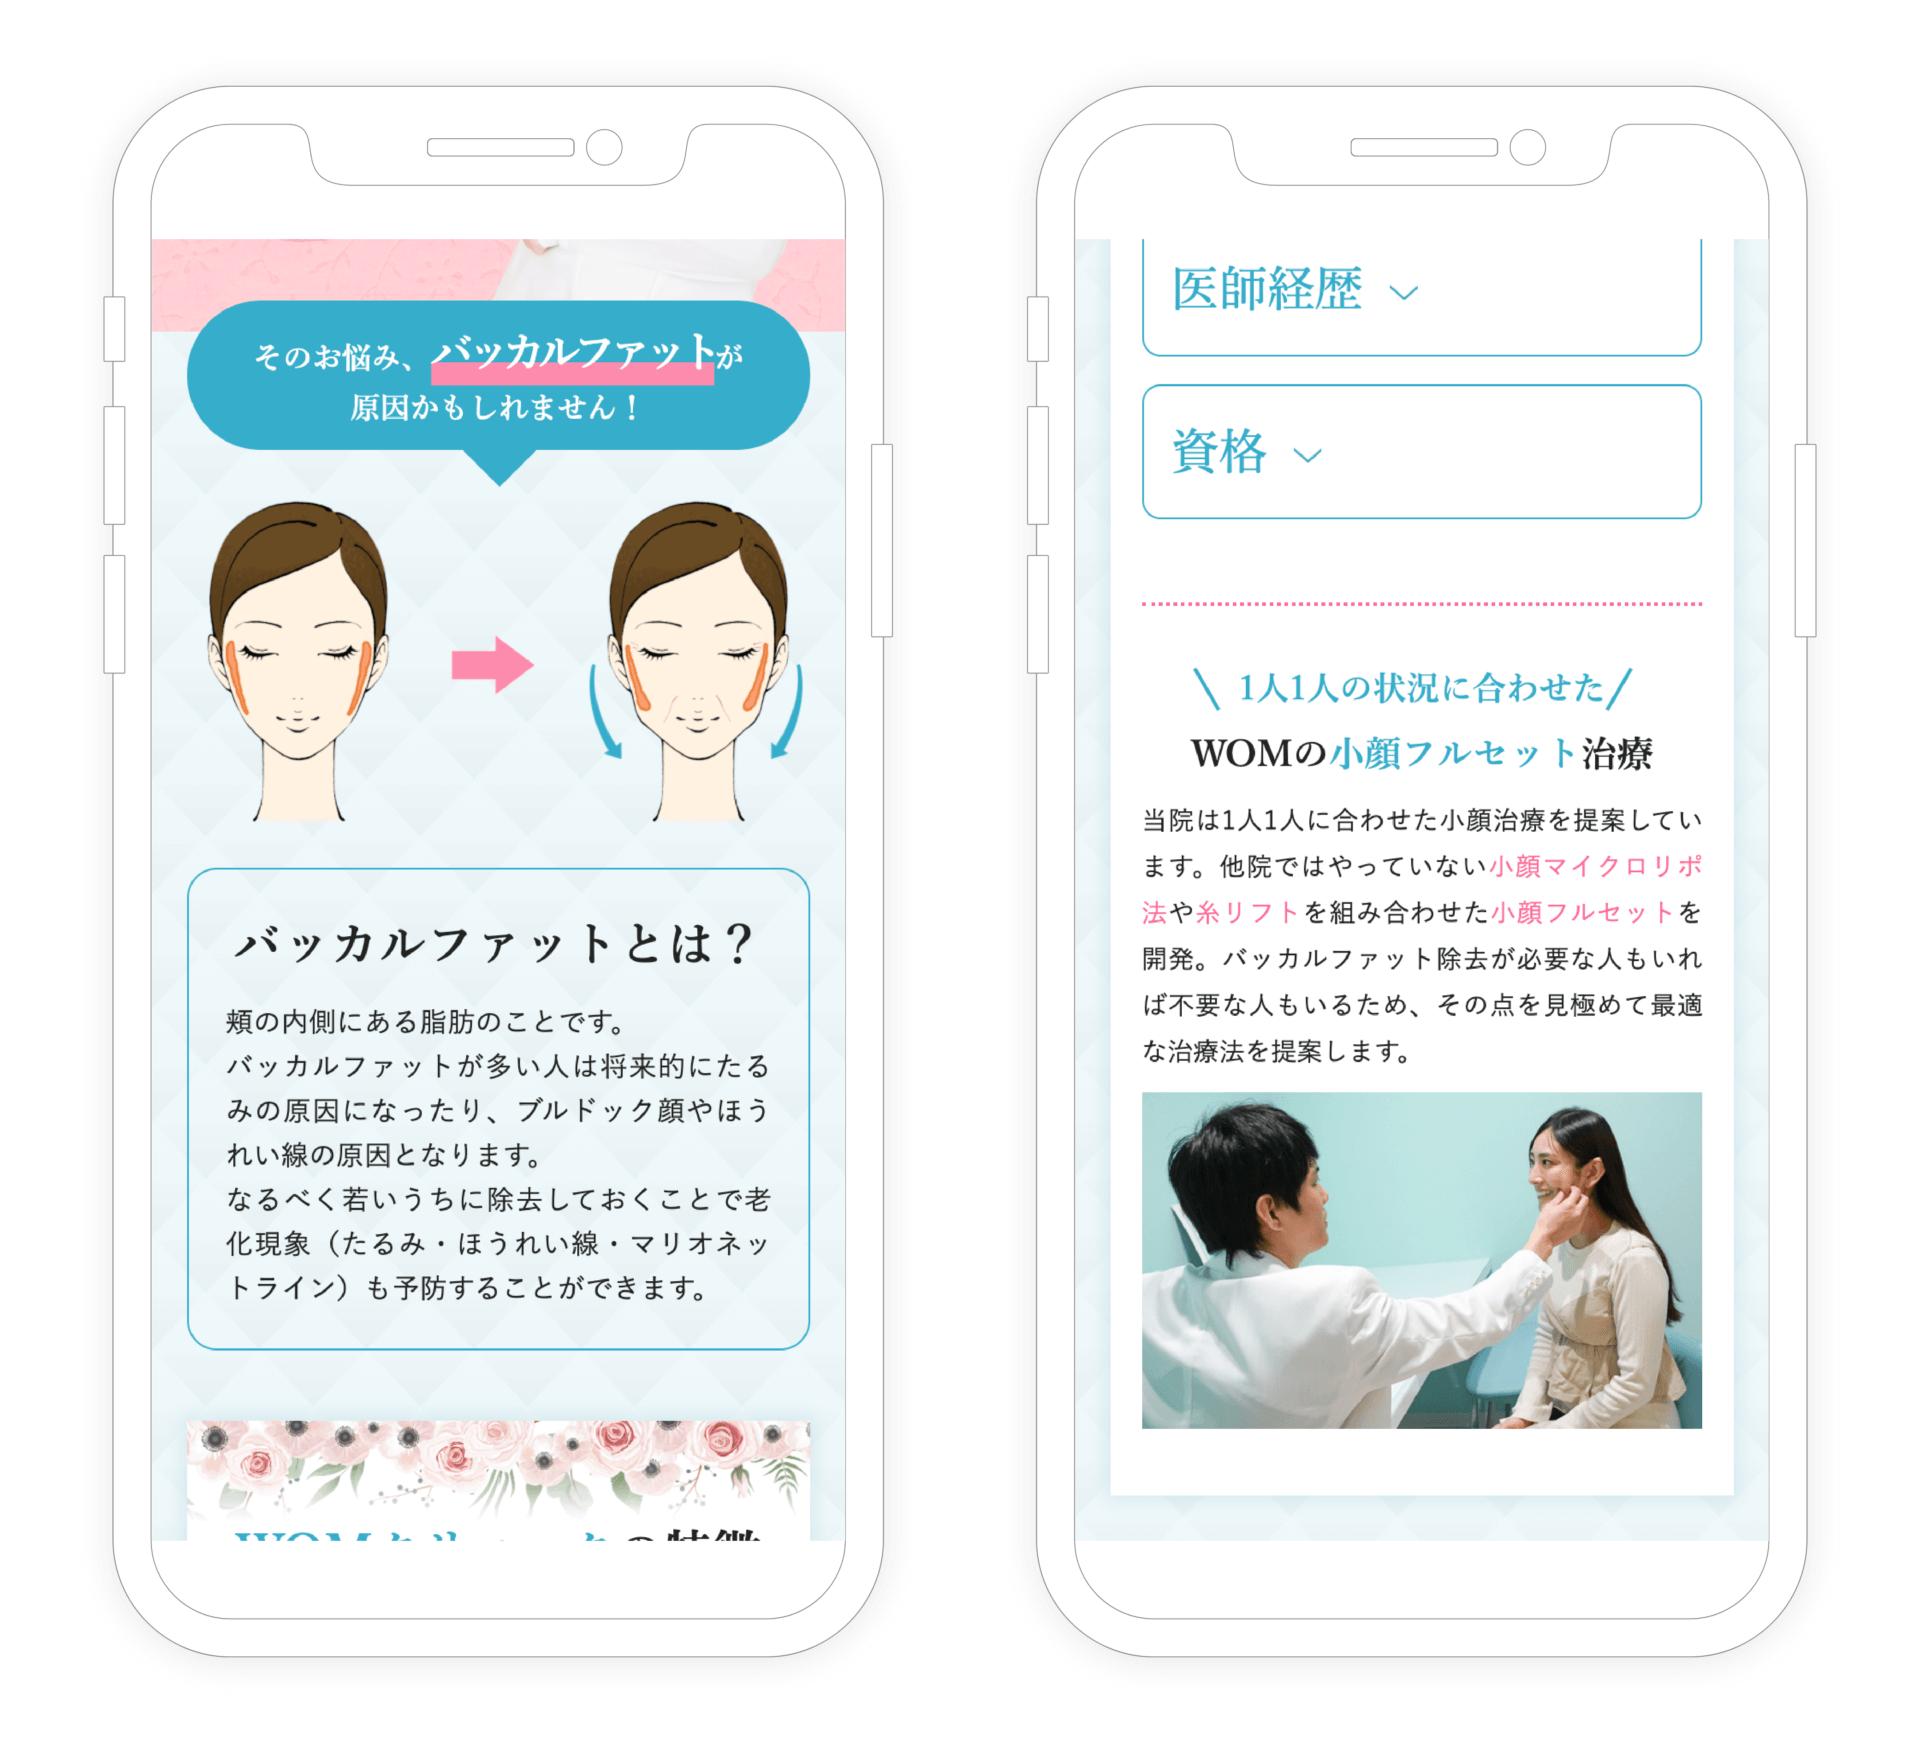 Wom clinic Ginza_kogao_lp02